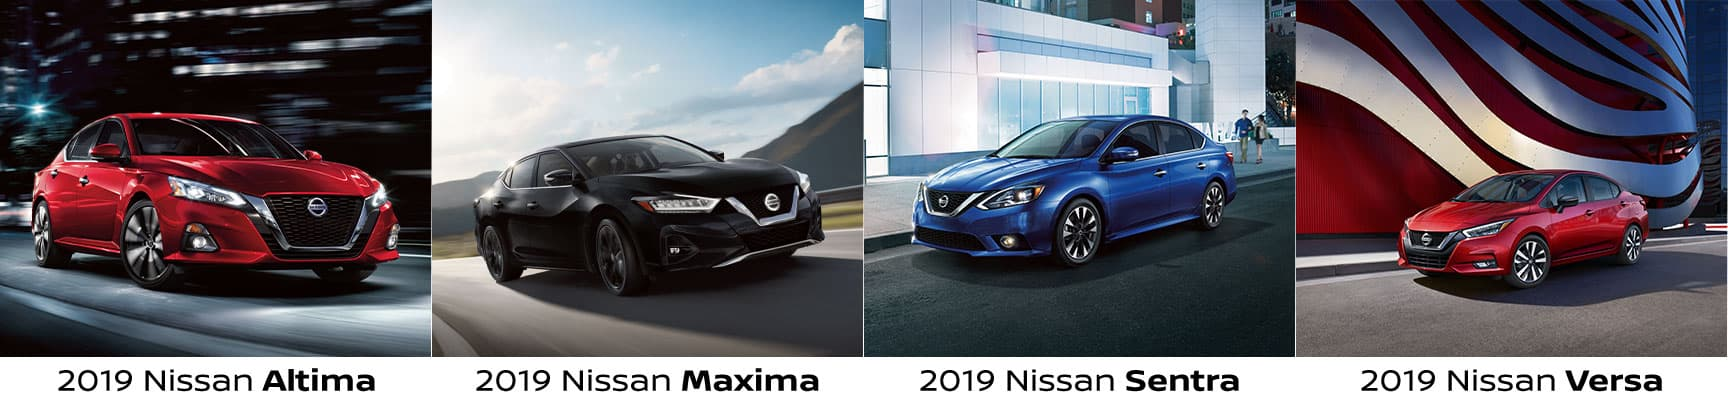 Comparing Nissan Sedan Models